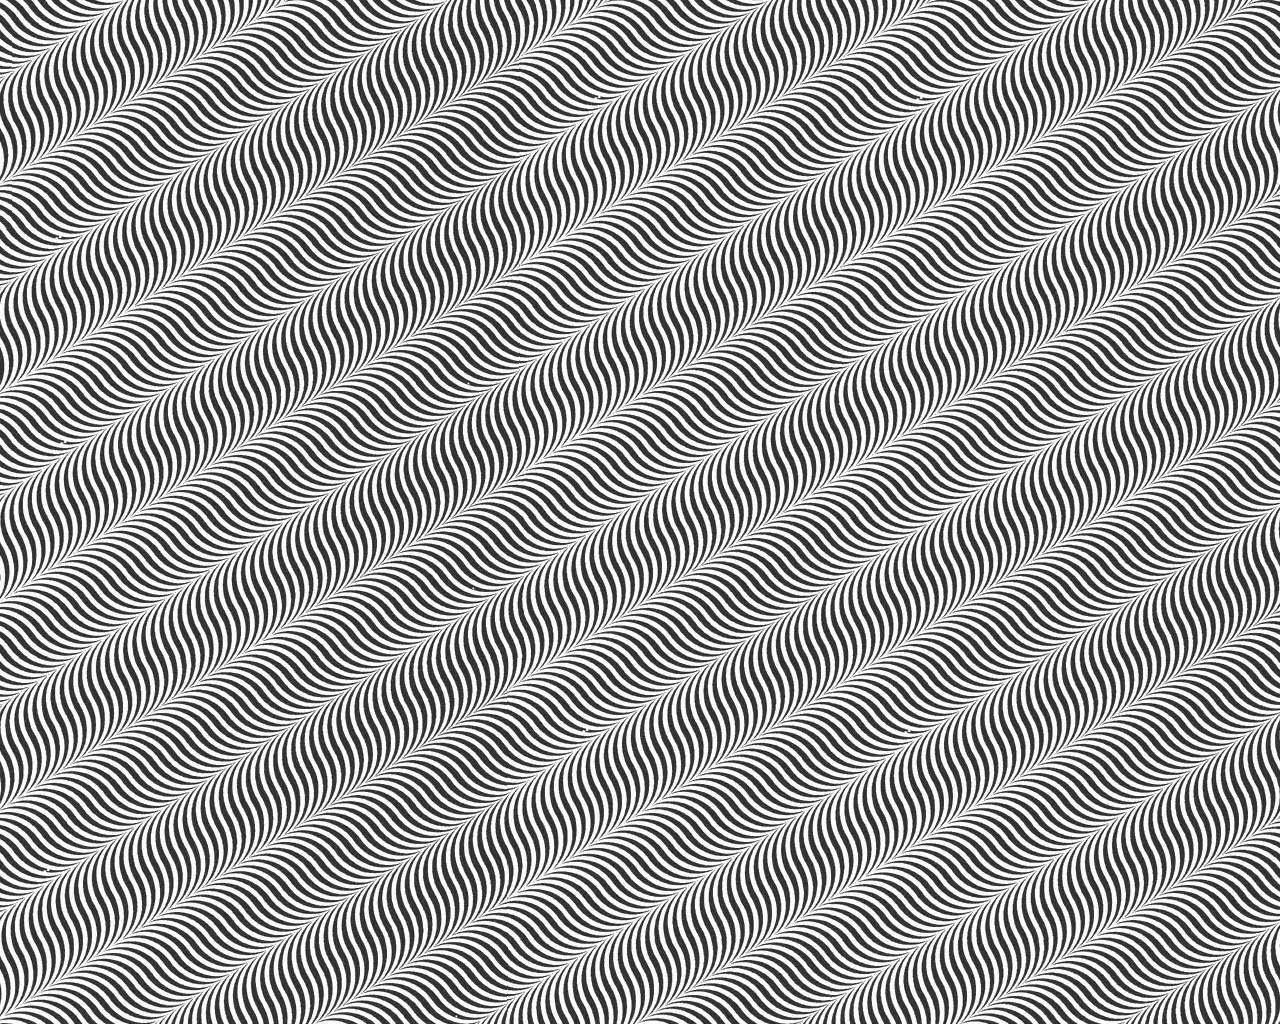 Optical Illusions MOVING OPTICAL ILLUSIONS